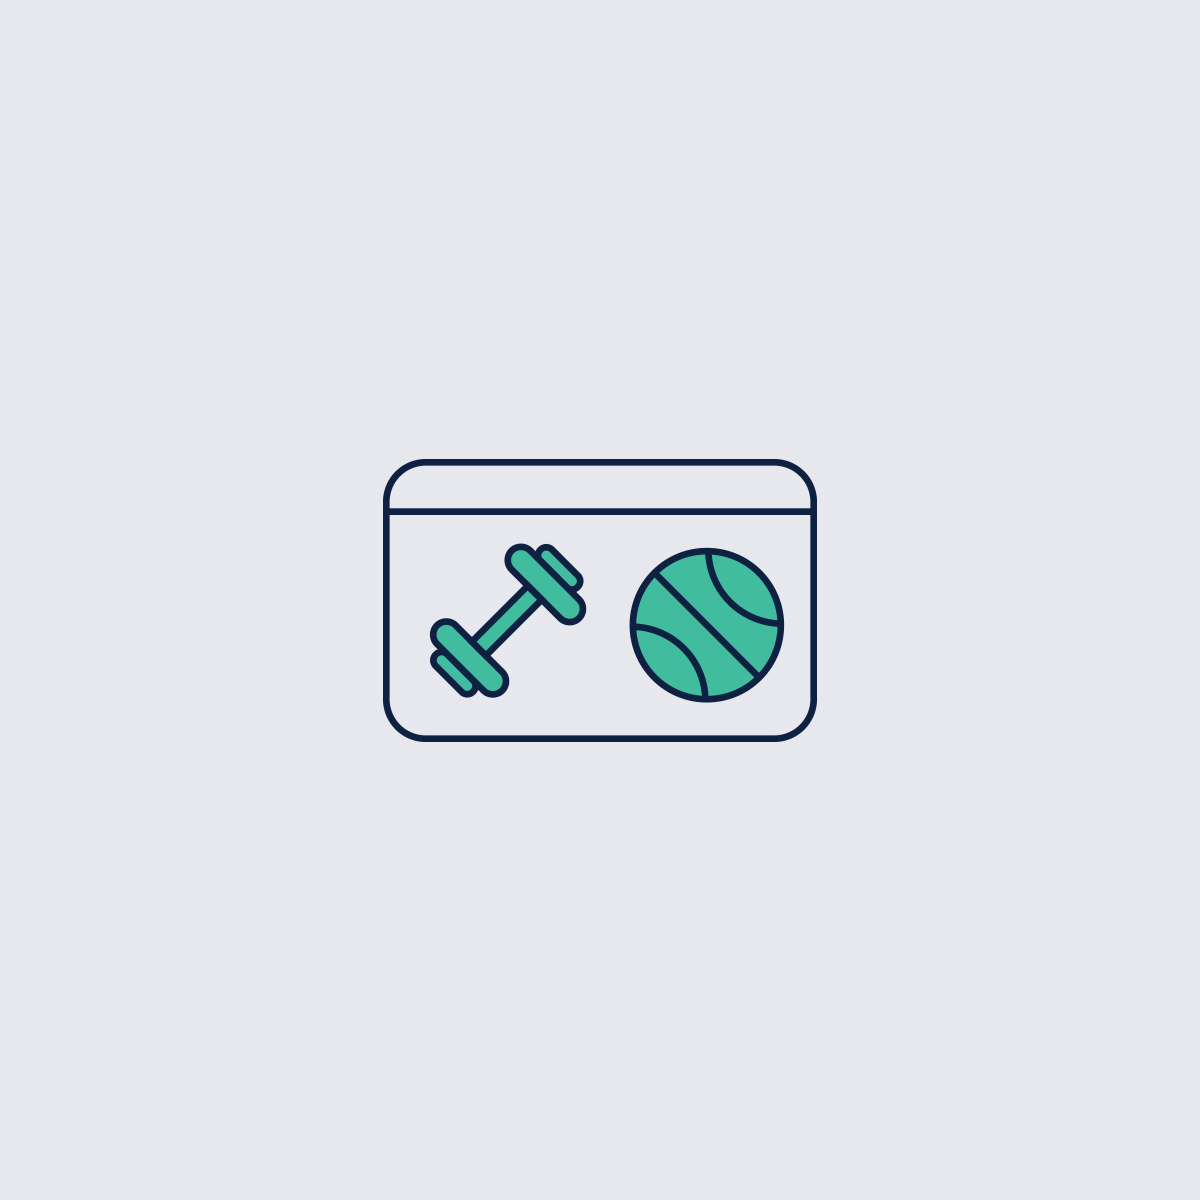 prozeta-icons-3